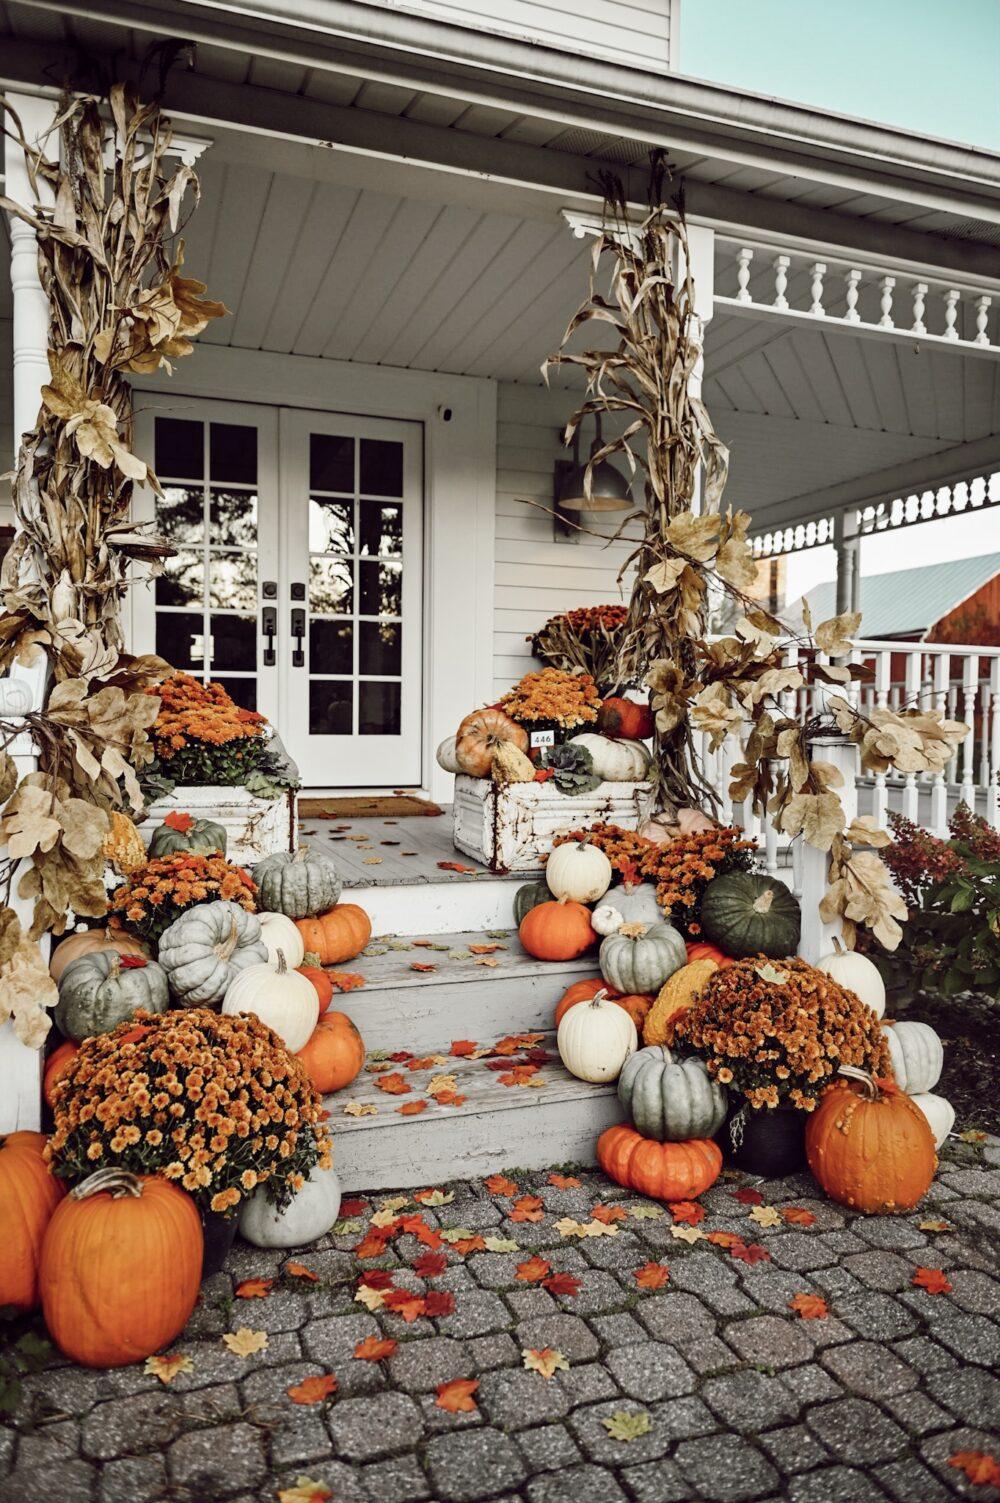 Cornstocks and pumpkins make this a beautiful fall porch to enjoy!